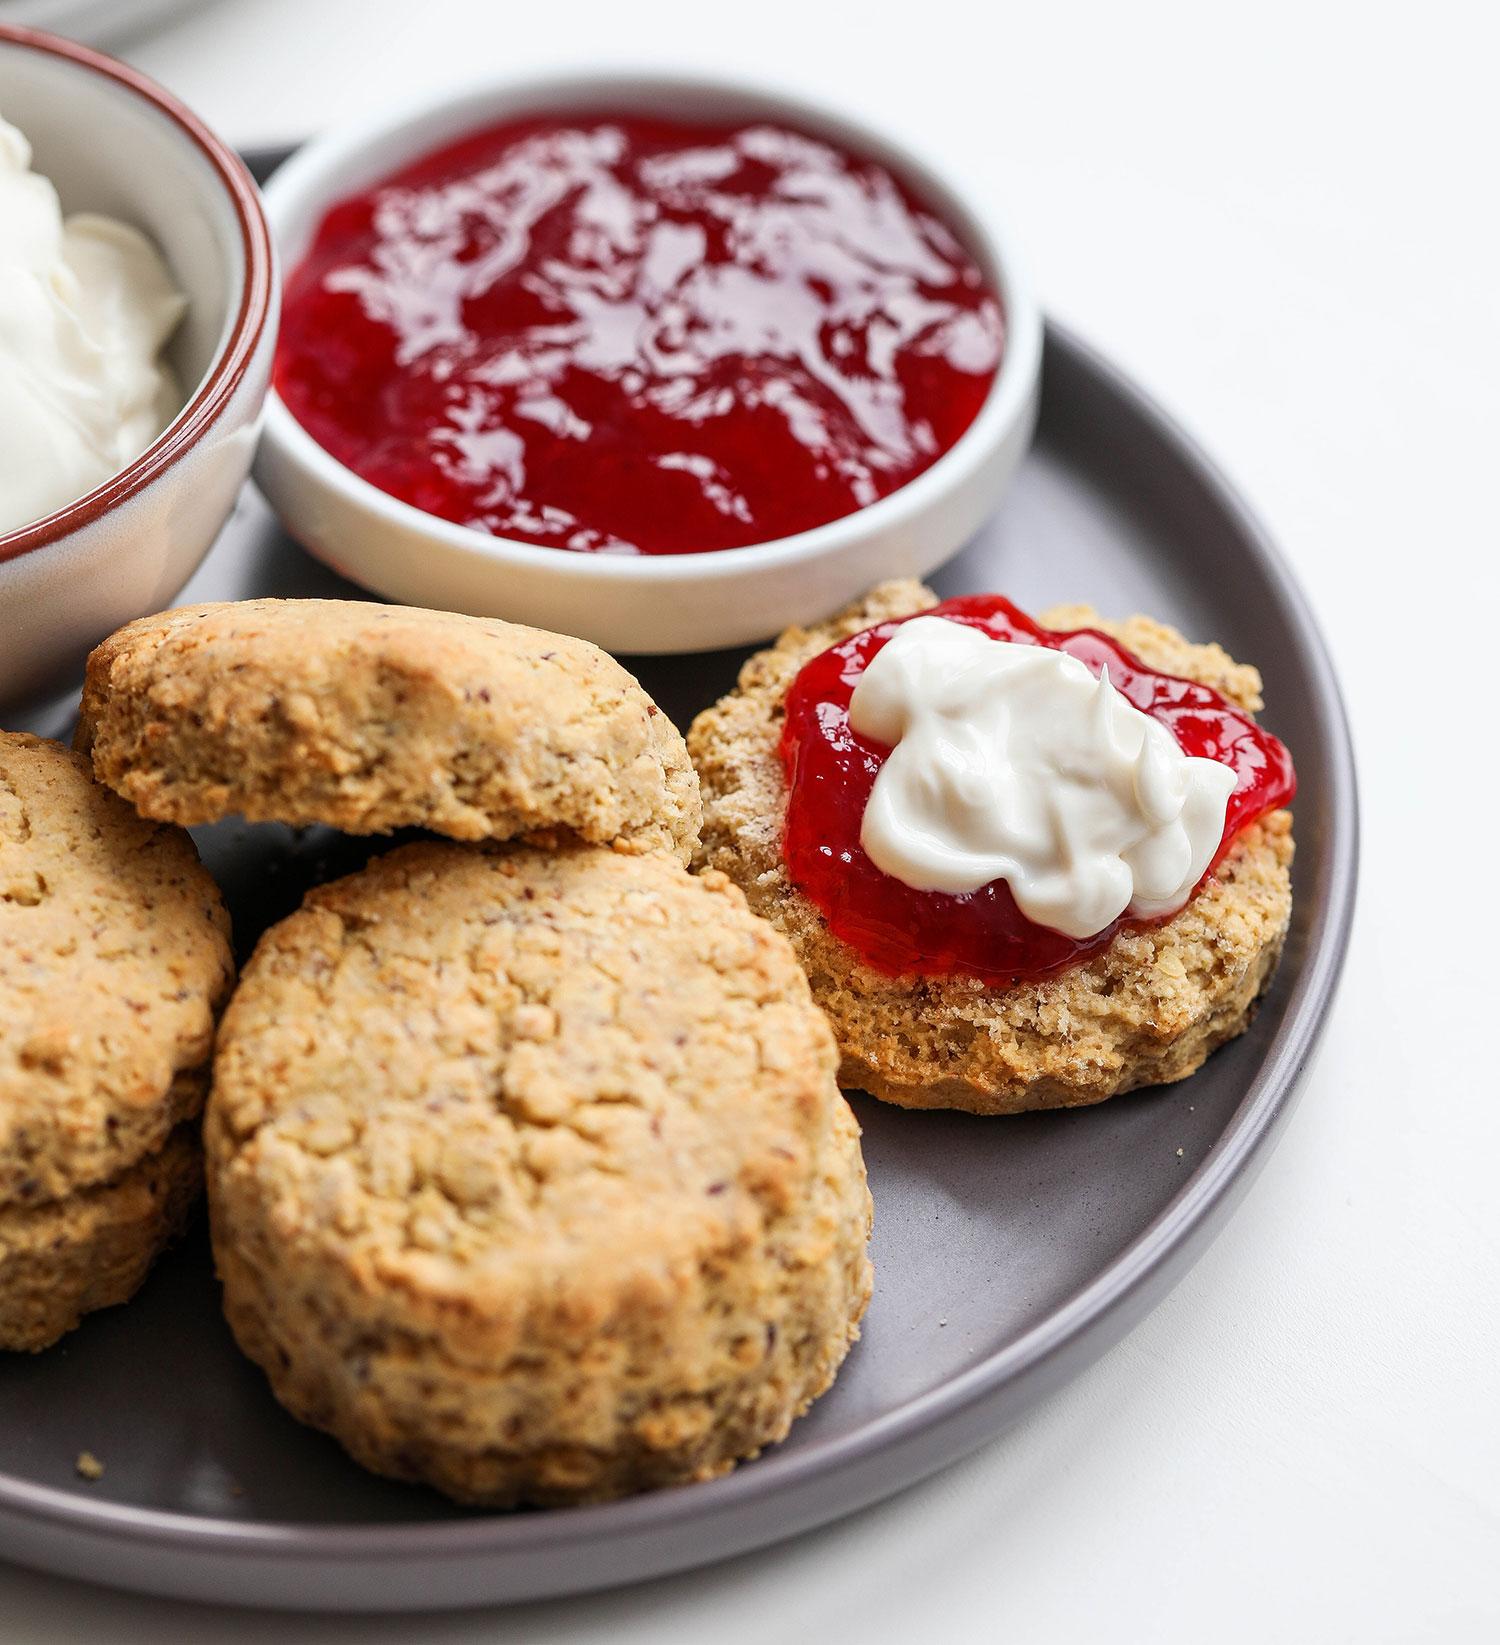 Vegan & Gluten-free Scones